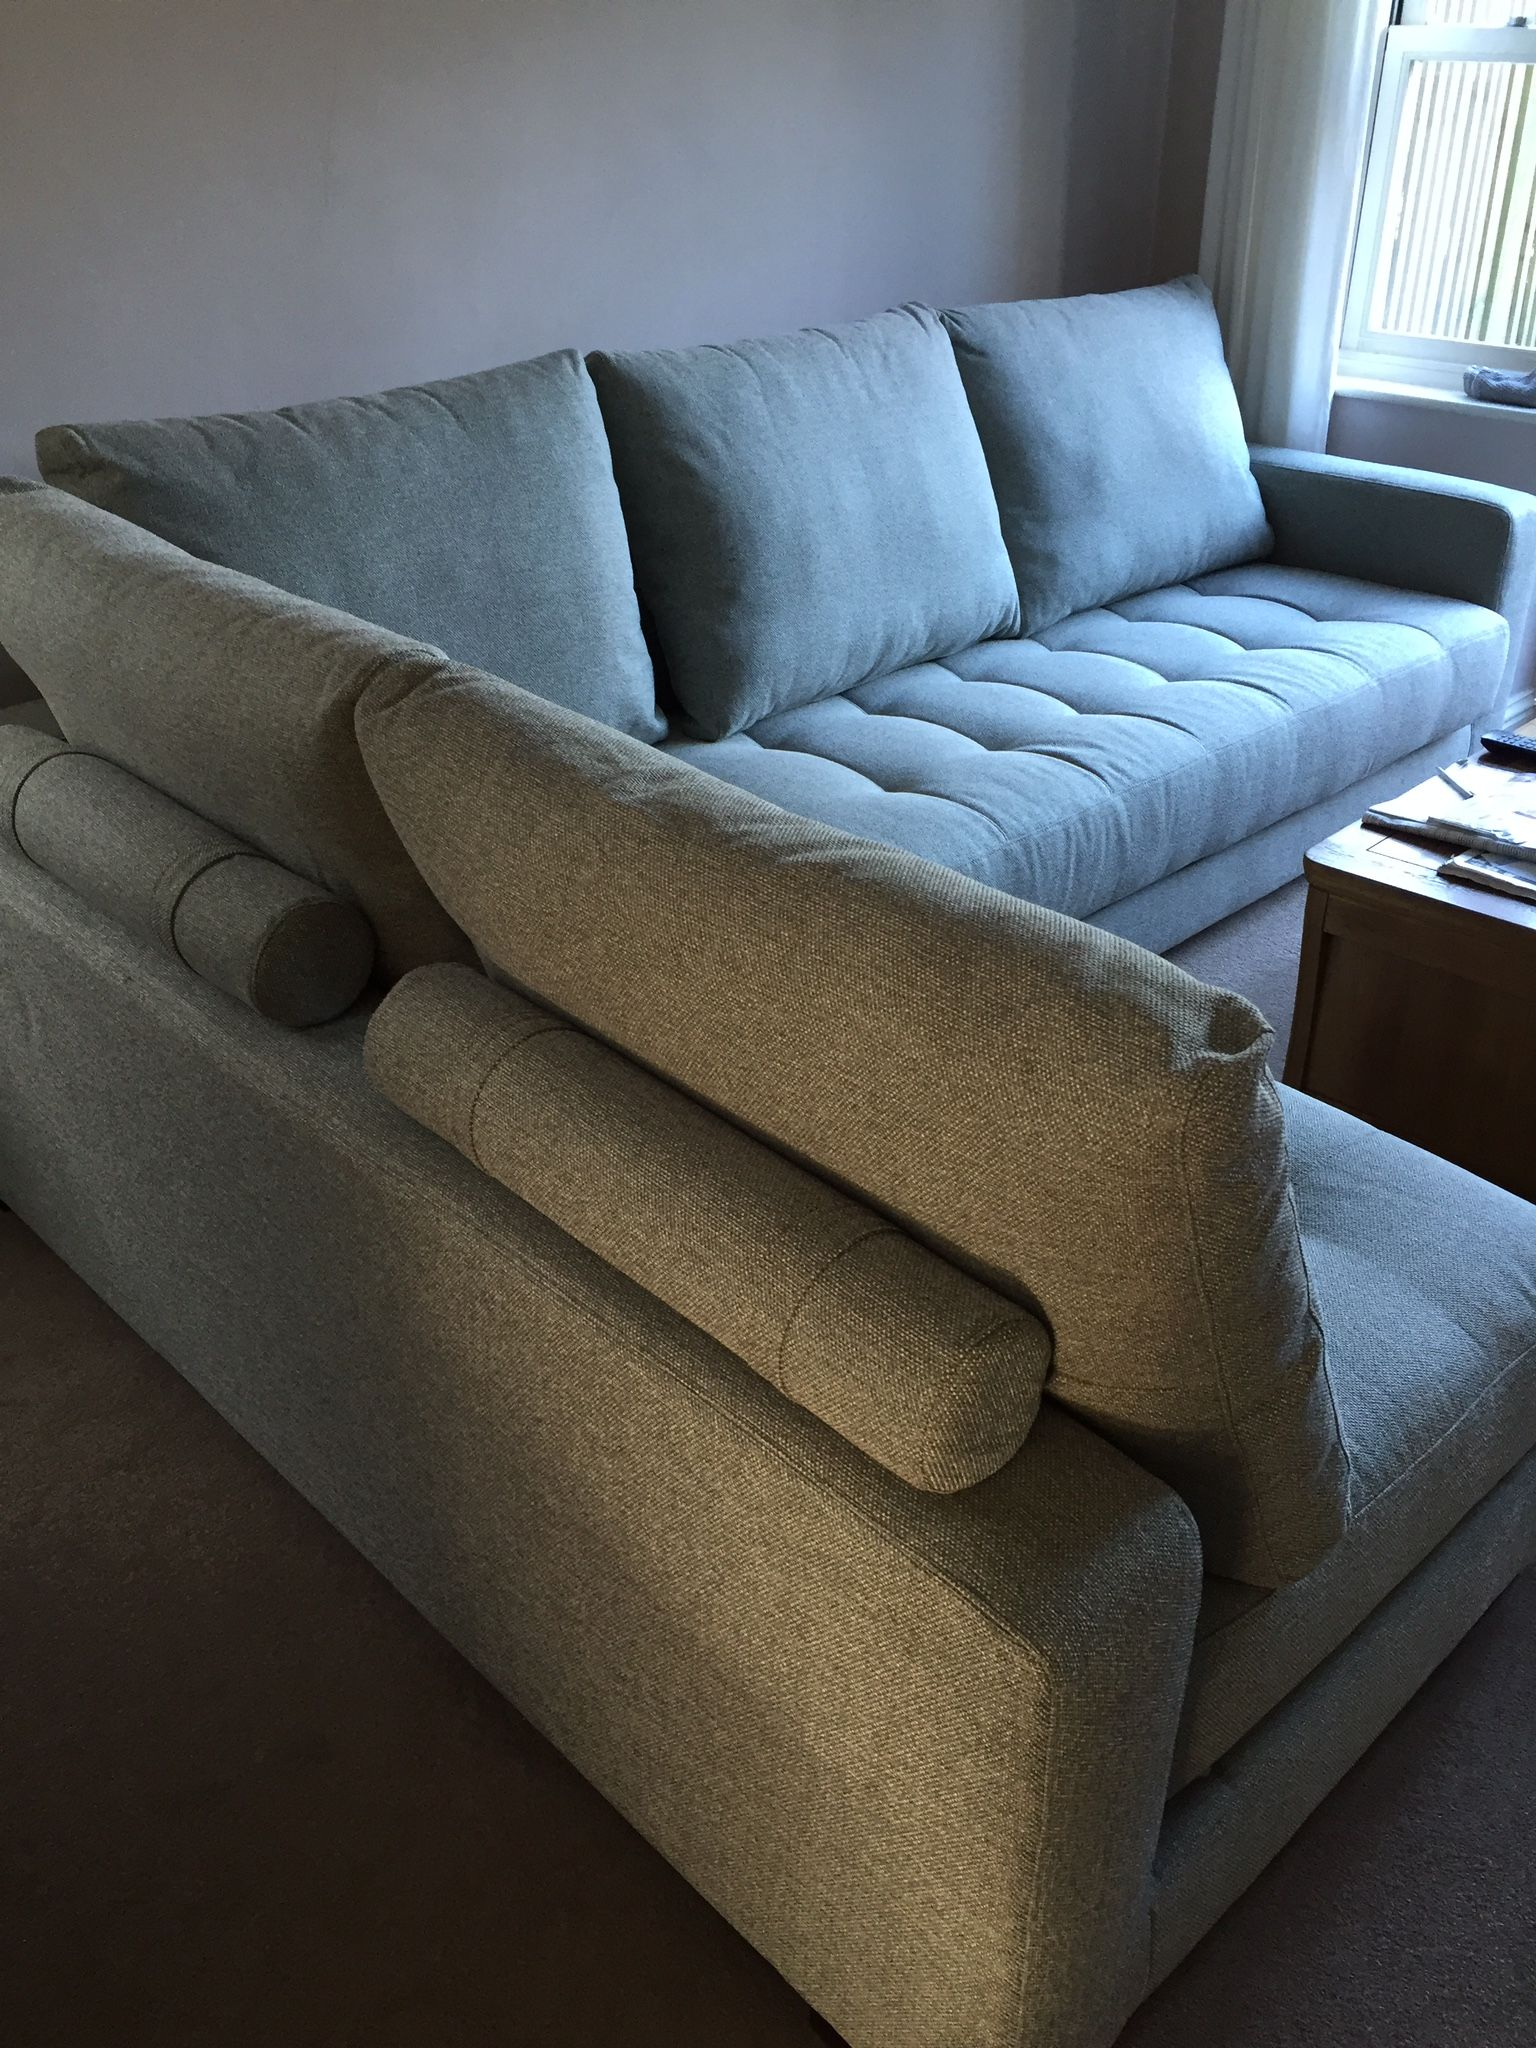 Tweed 49 Fabric On Two 200cm X 100 Cm One Arm Sofa Modules Create A 300